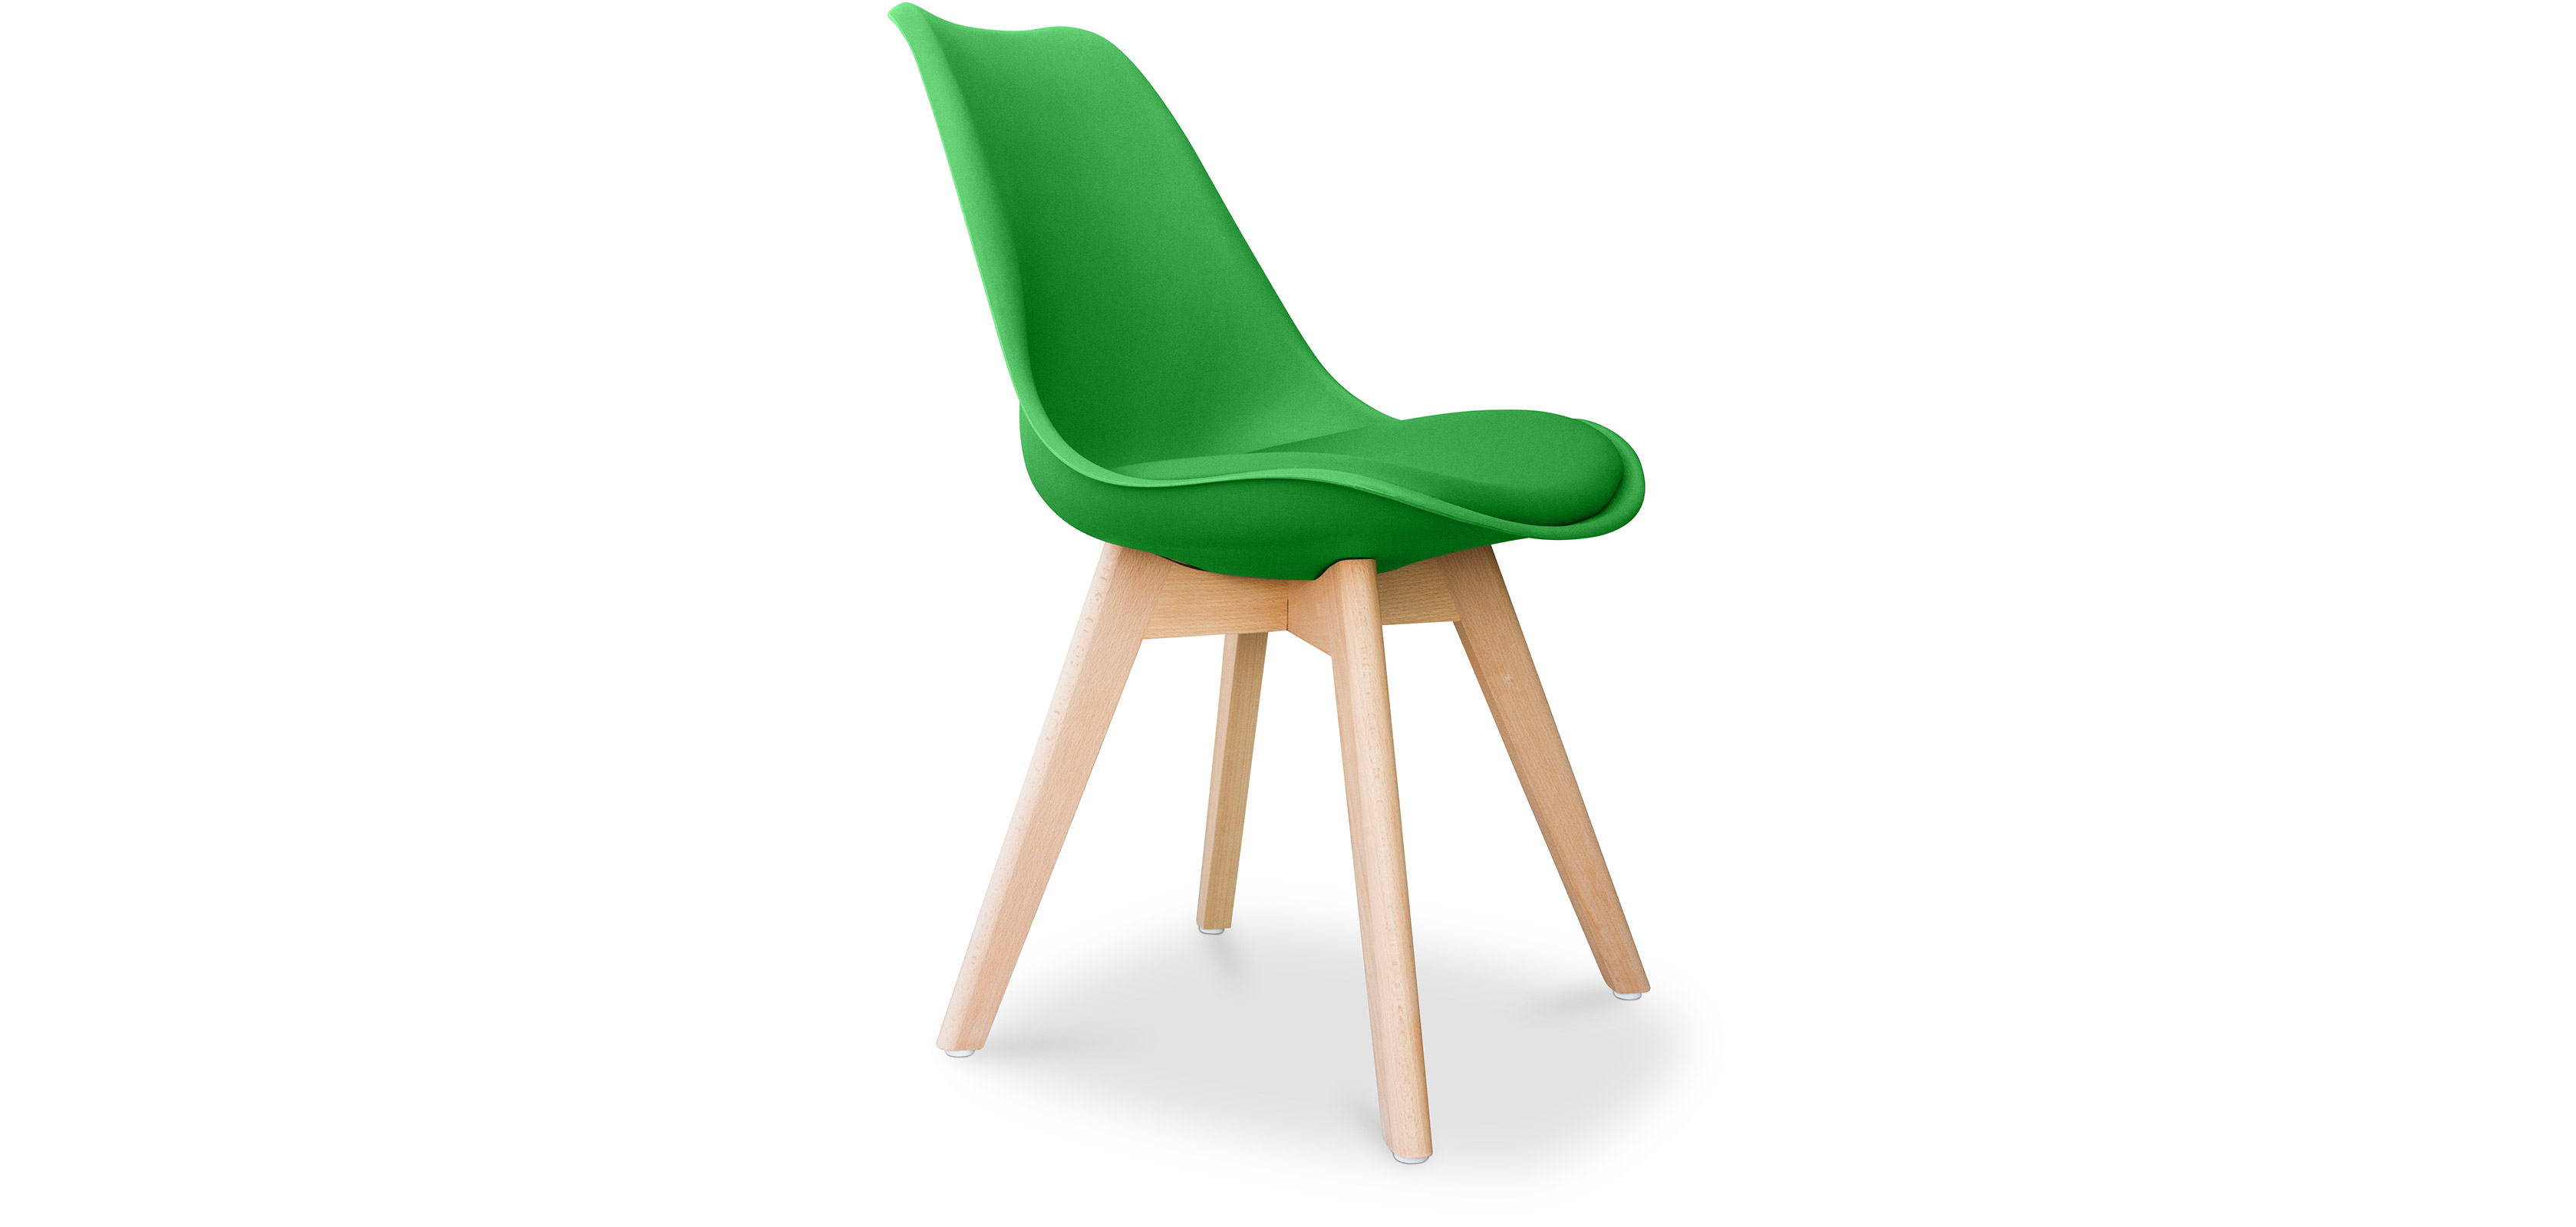 dsw stuhl mit kissen skandinavisches design charles eames style. Black Bedroom Furniture Sets. Home Design Ideas